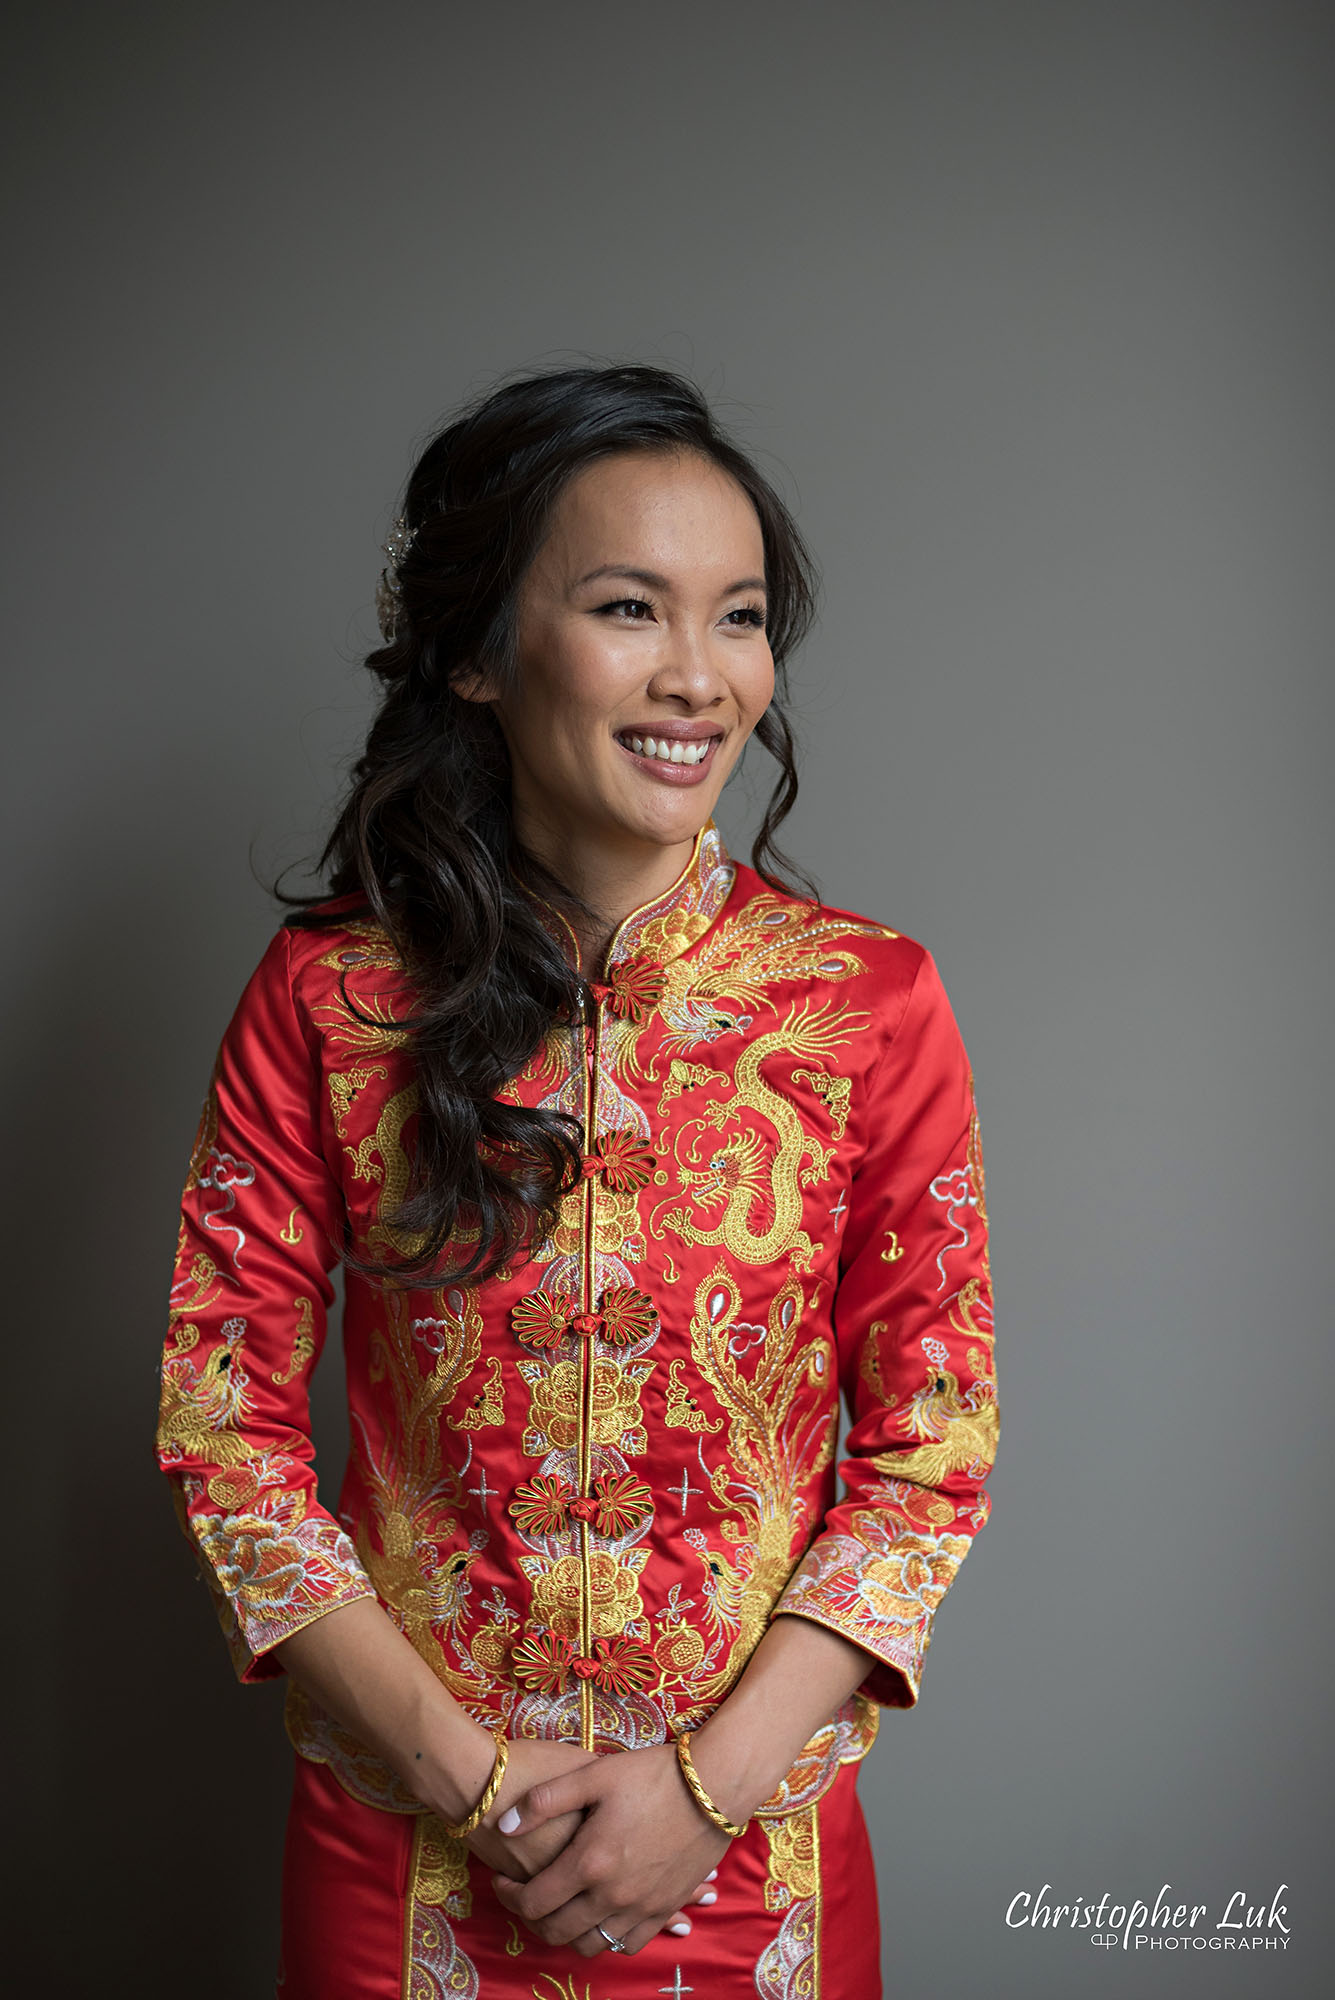 Christopher Luk Photography Toronto Wedding Photographer Chinese Tea Ceremony Bride Candid Natural Photojournalistic Happy Smile Qipao Cheongsam Kua Qua Red Dress